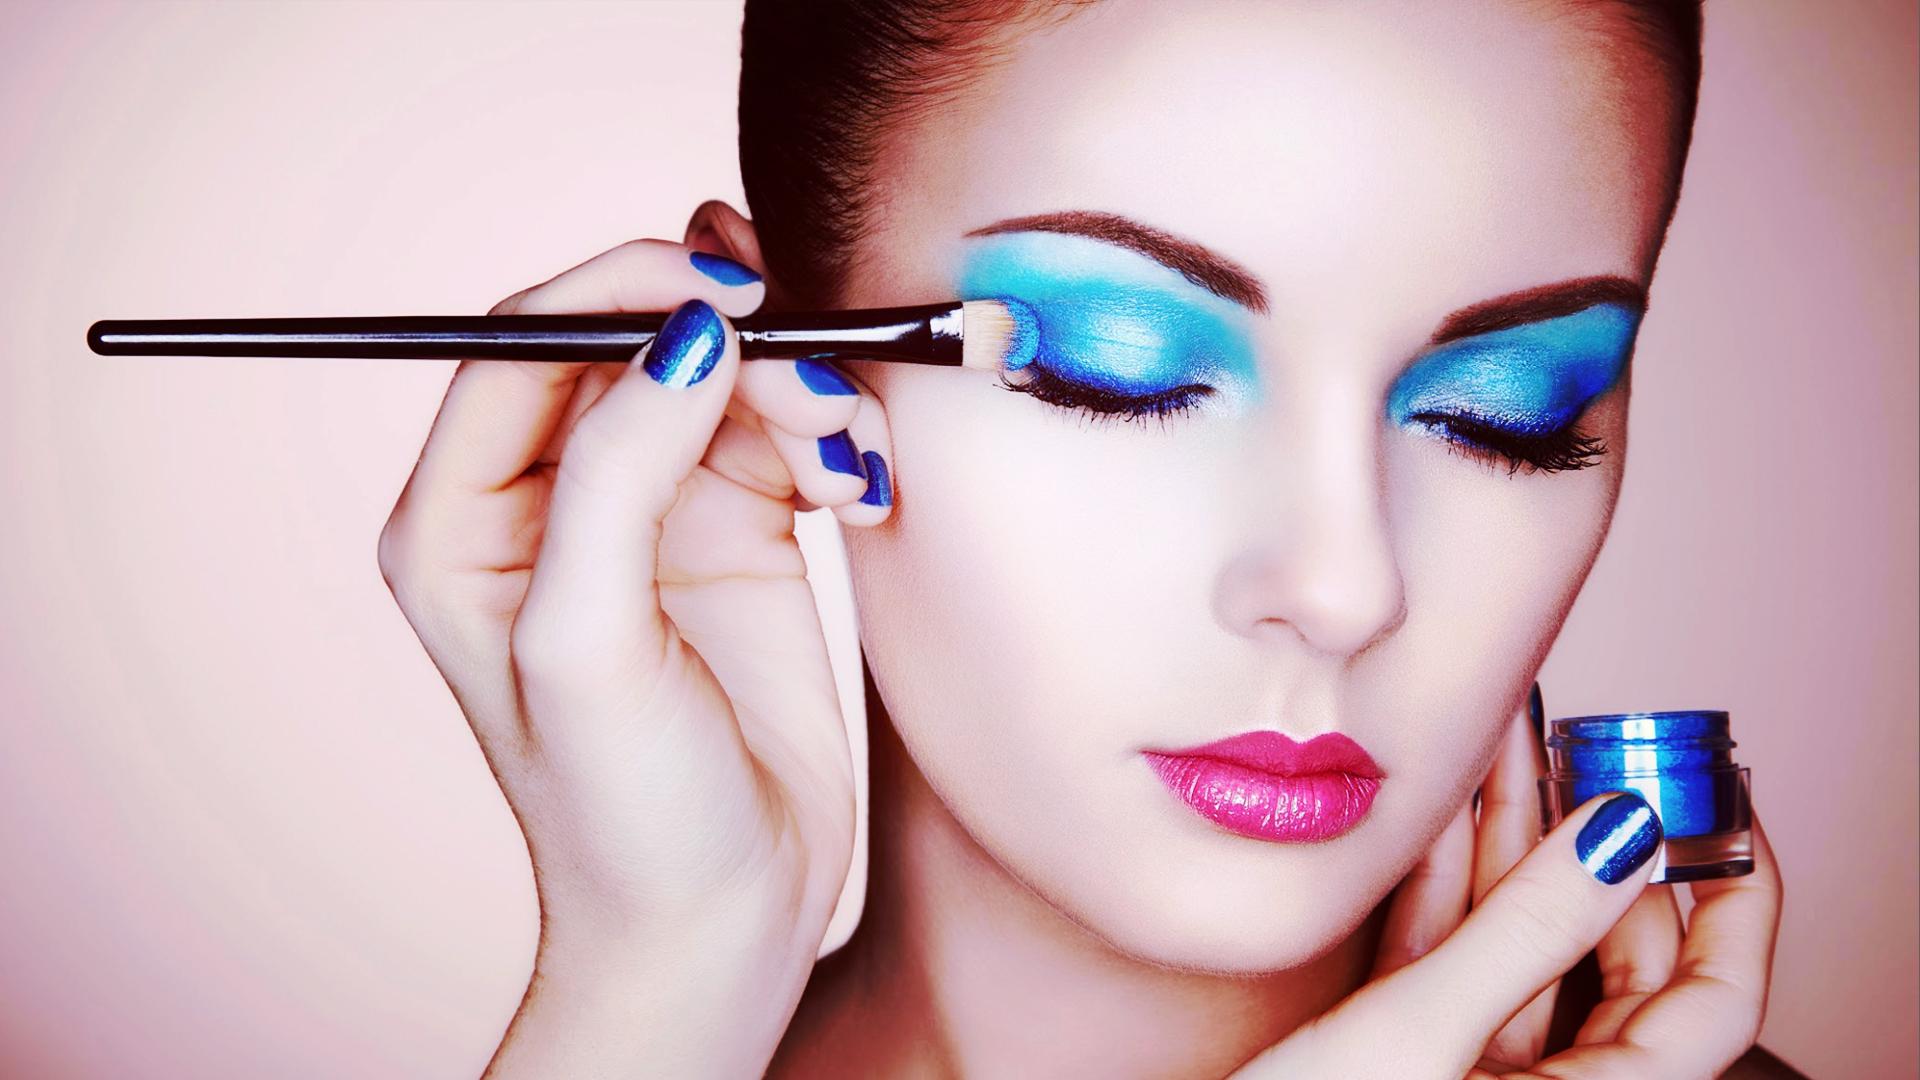 animated makeup wallpaper - photo #8